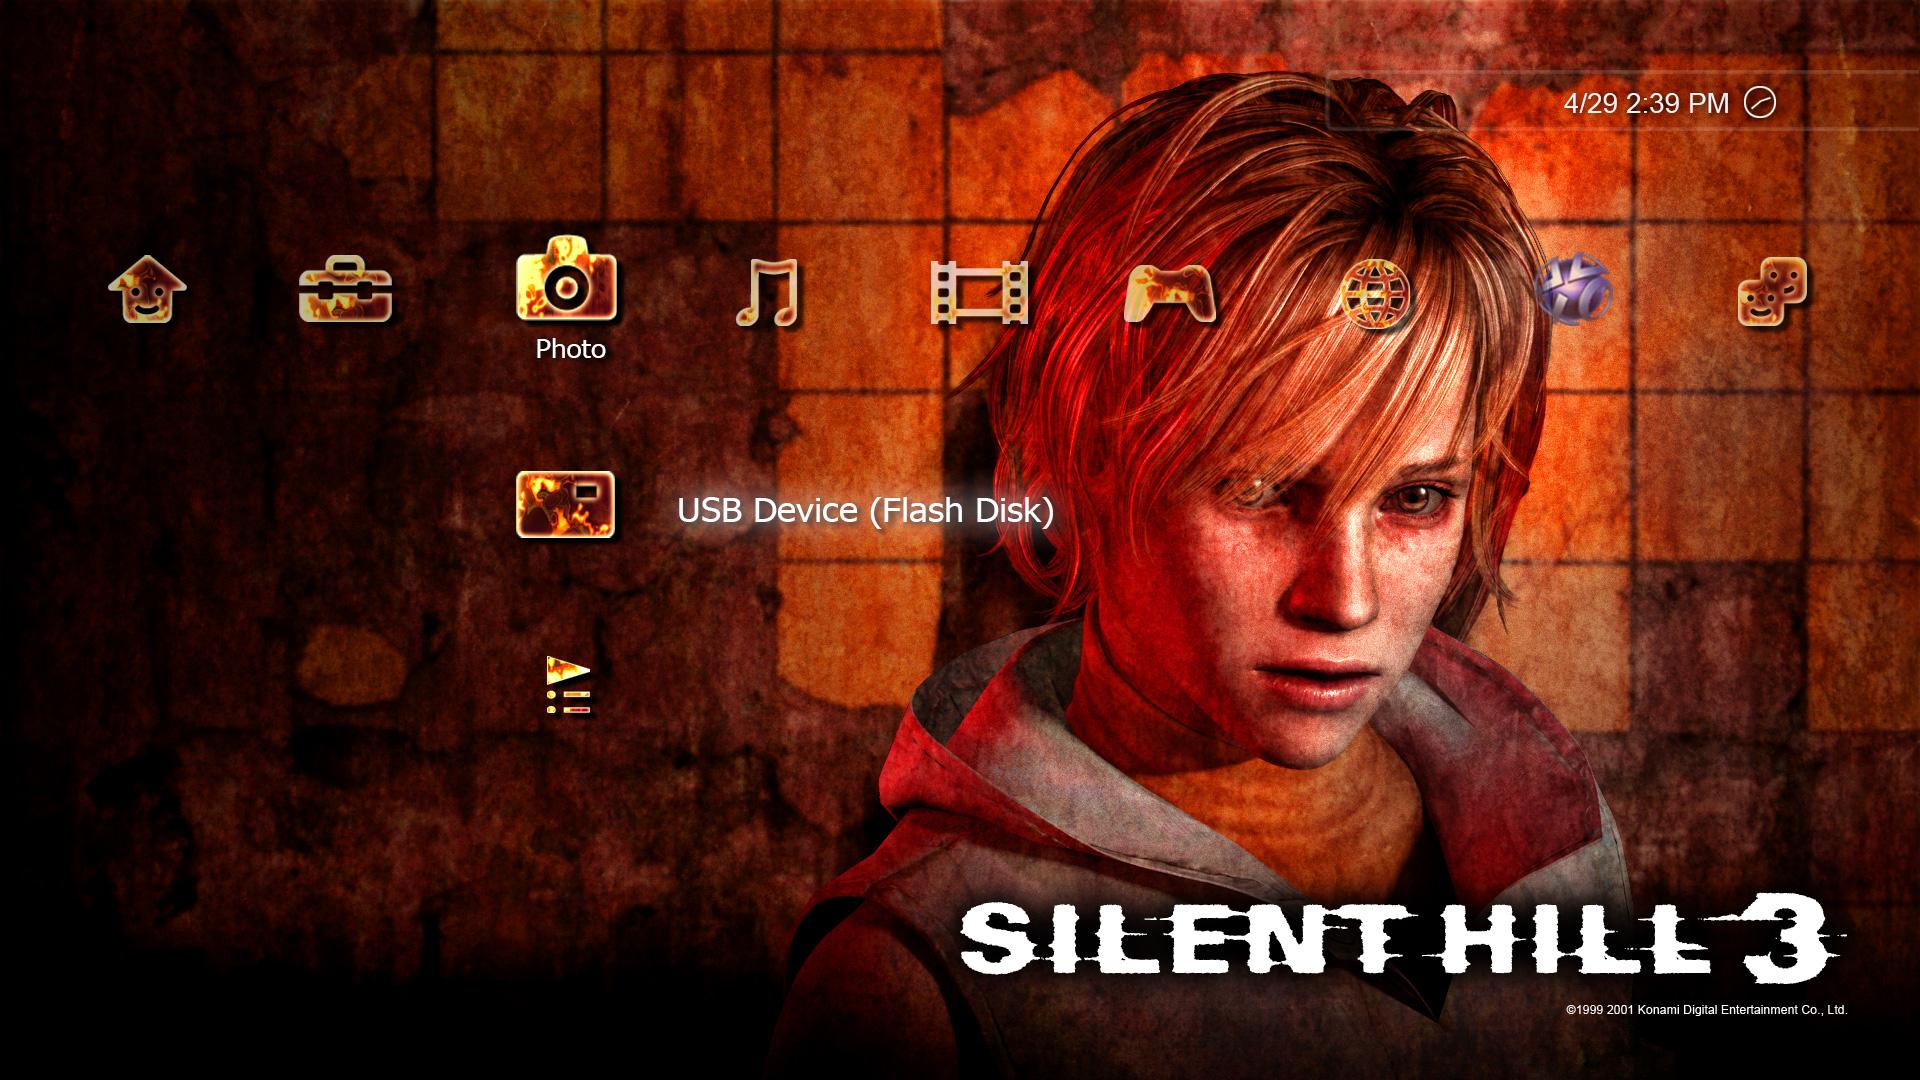 PS3 THEMES — Casey Matsumoto - Concept Artist / UI Designer